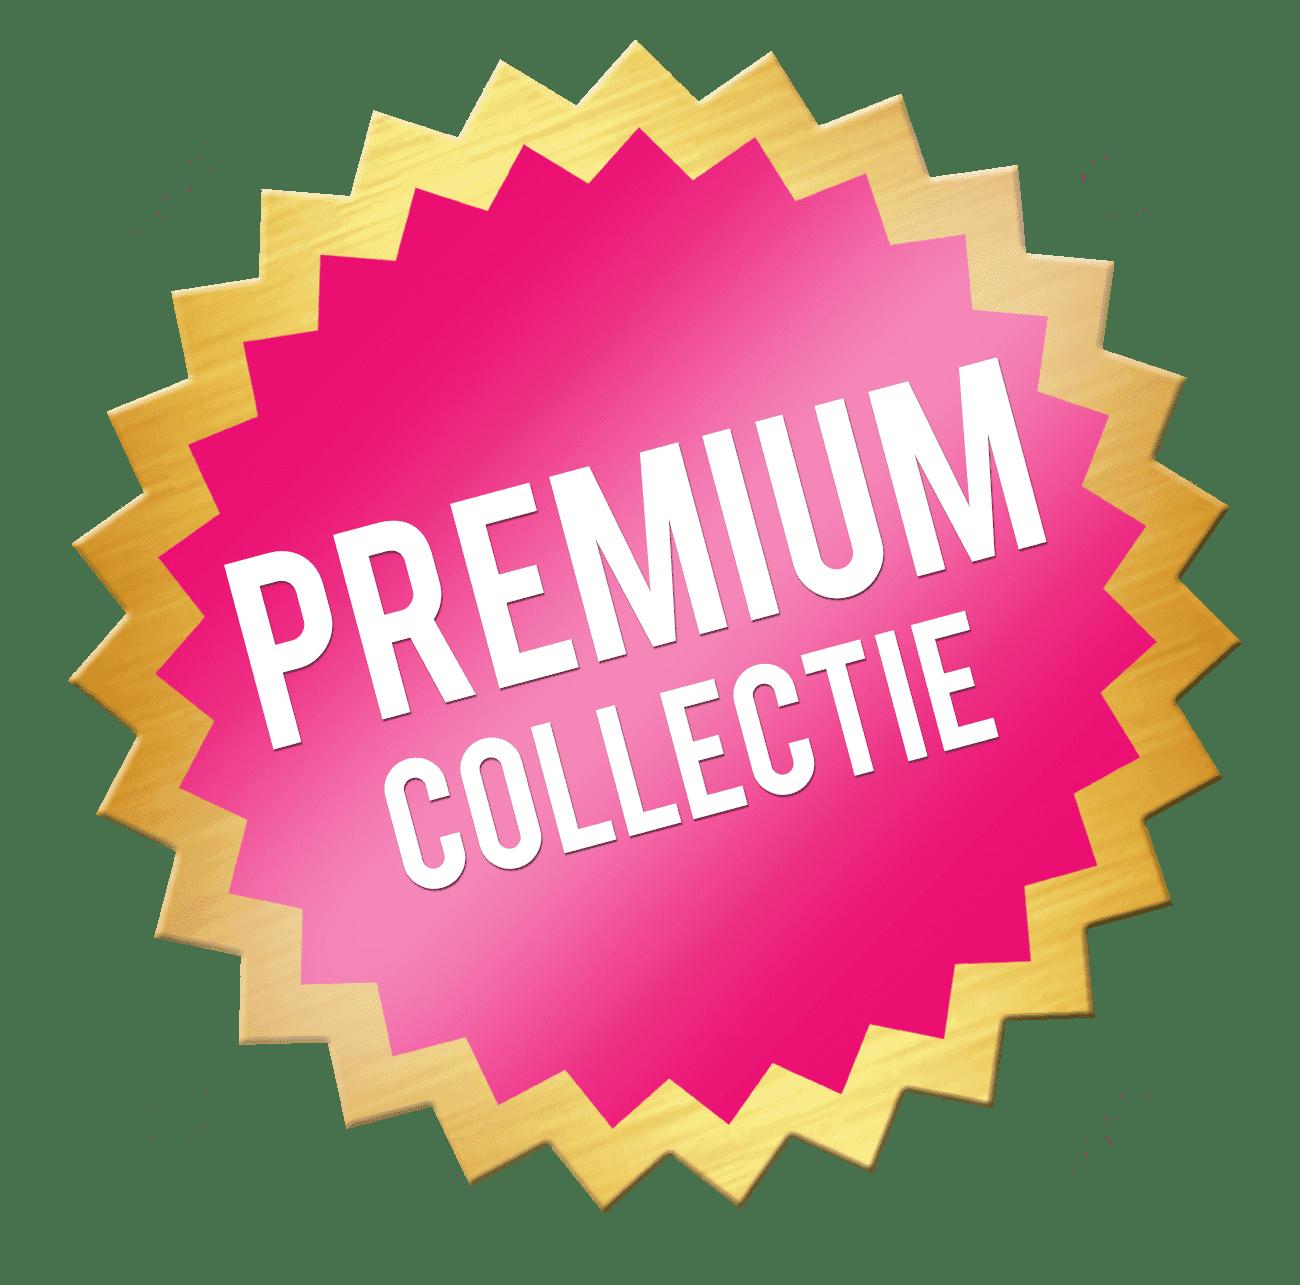 premium - Rood wit geblokt overhemd